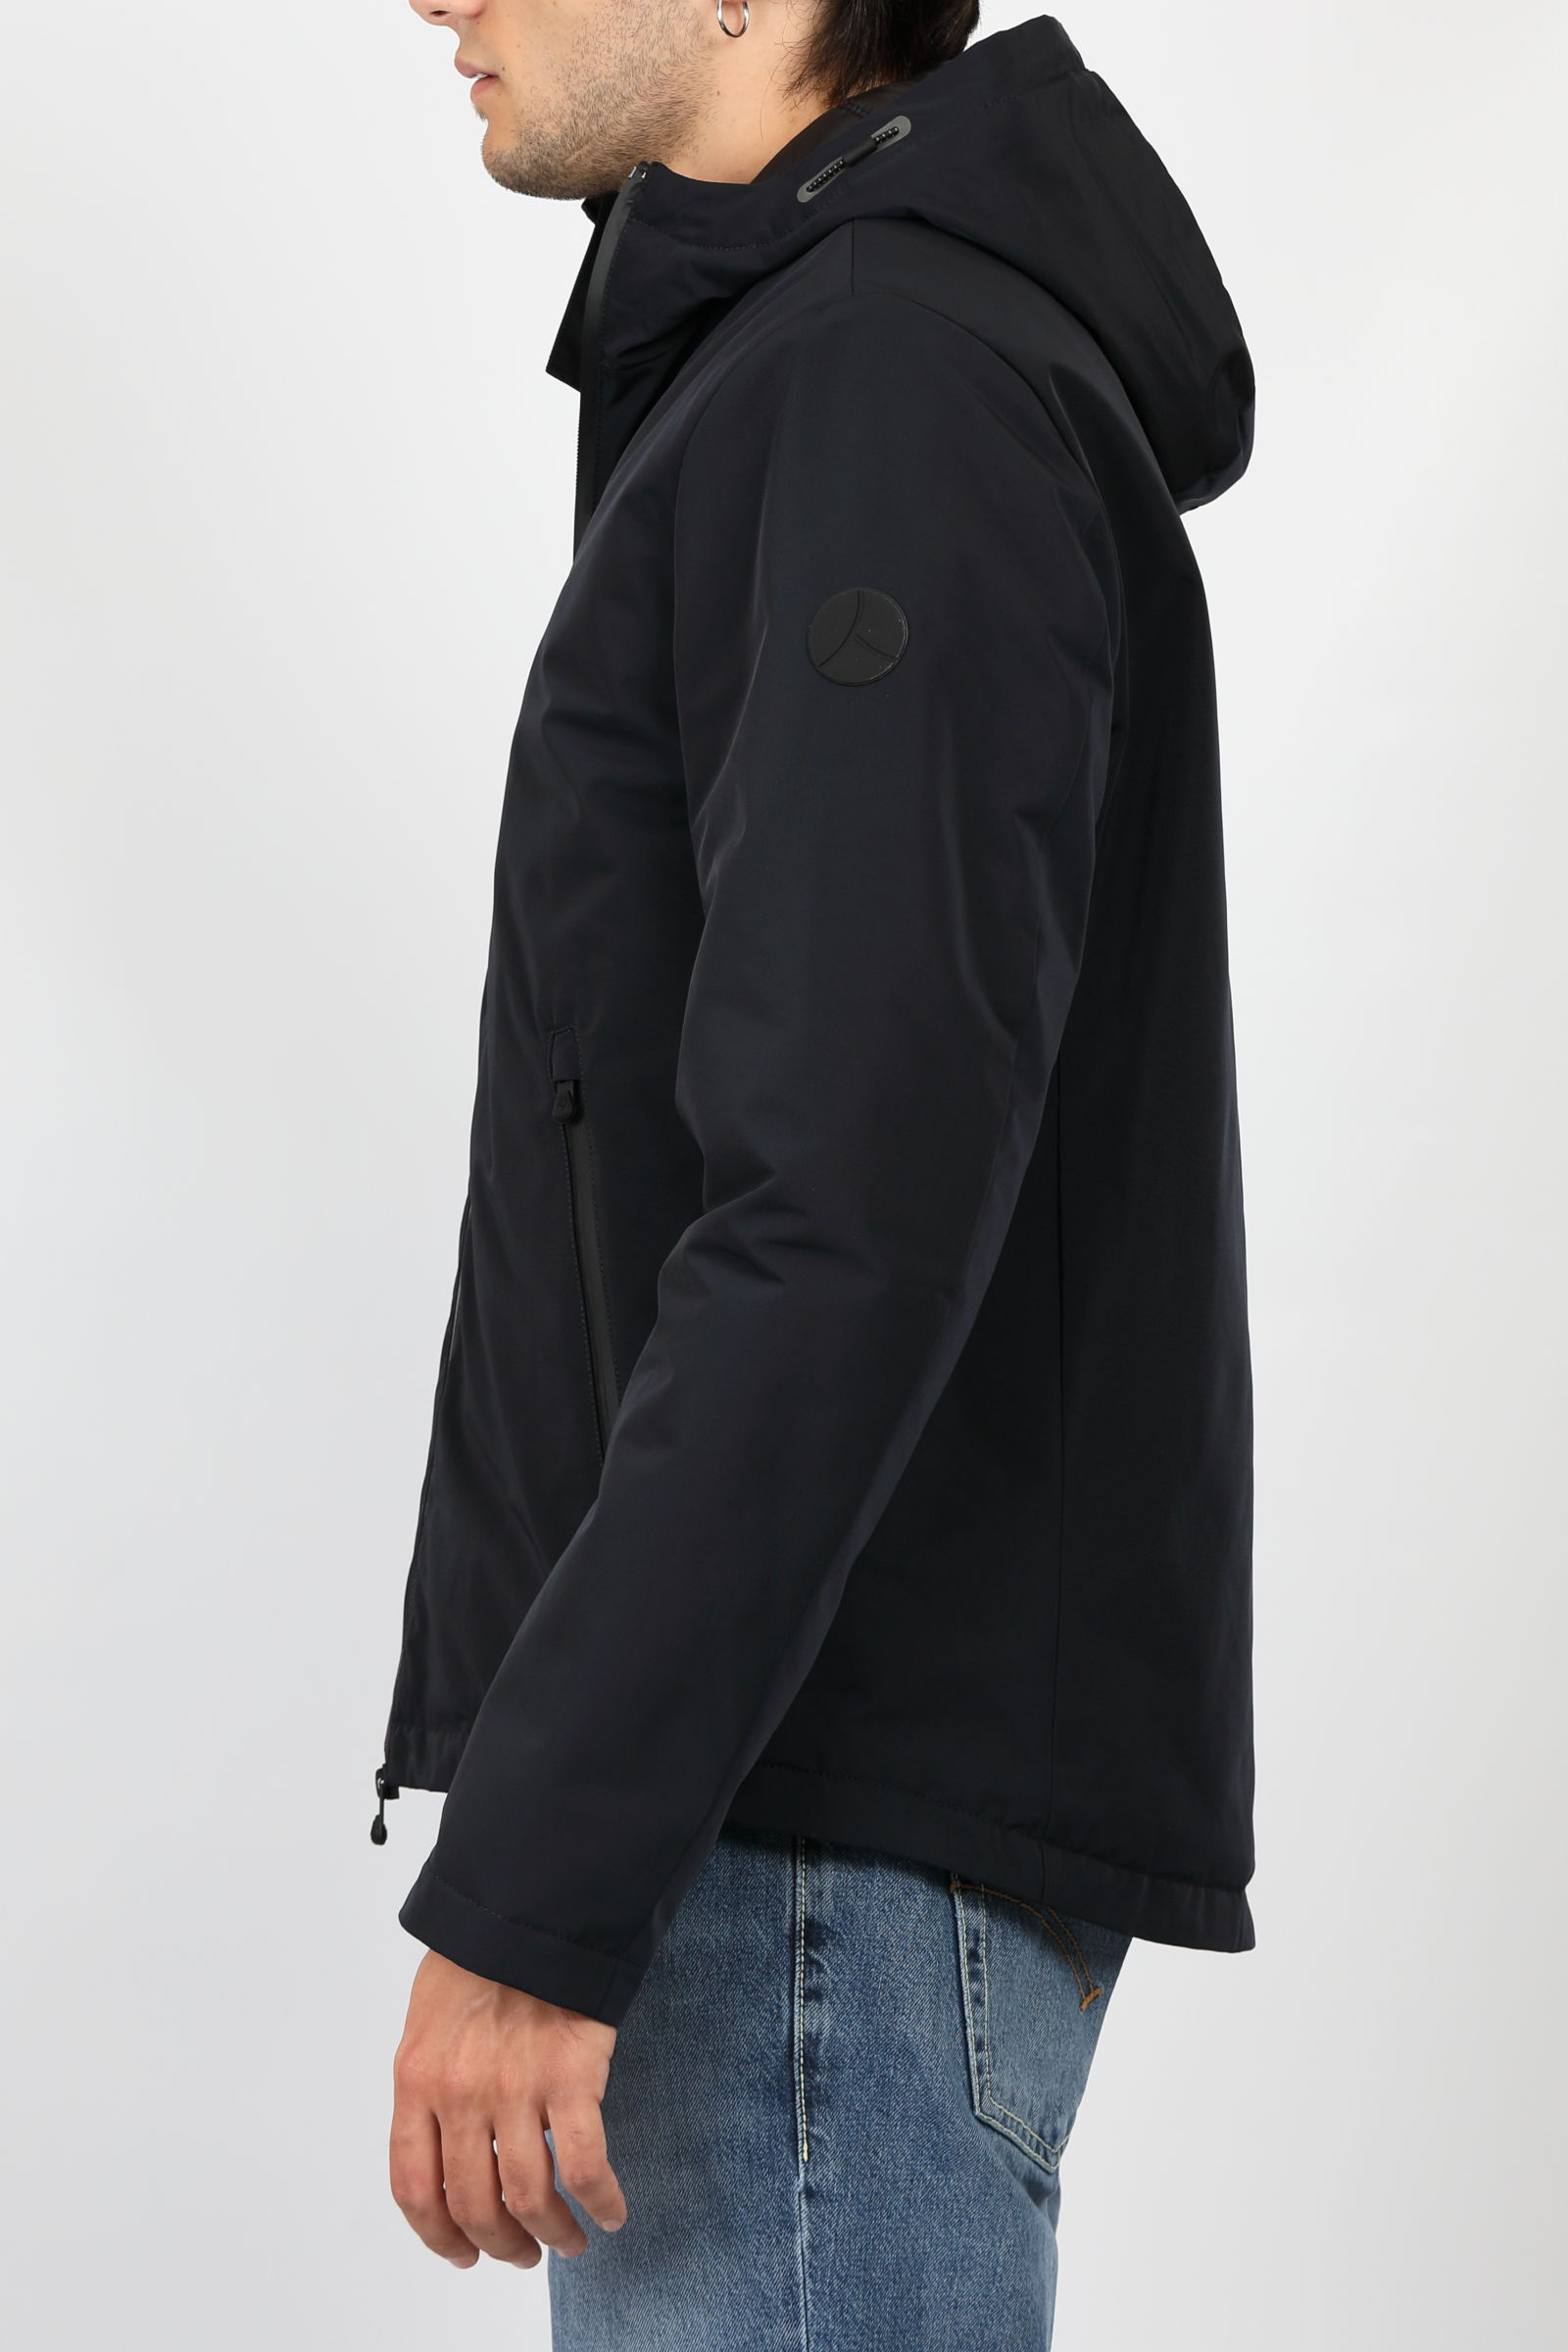 KITA PEOPLE OF SHIBUYA | Outerwear | KITA-PM769790